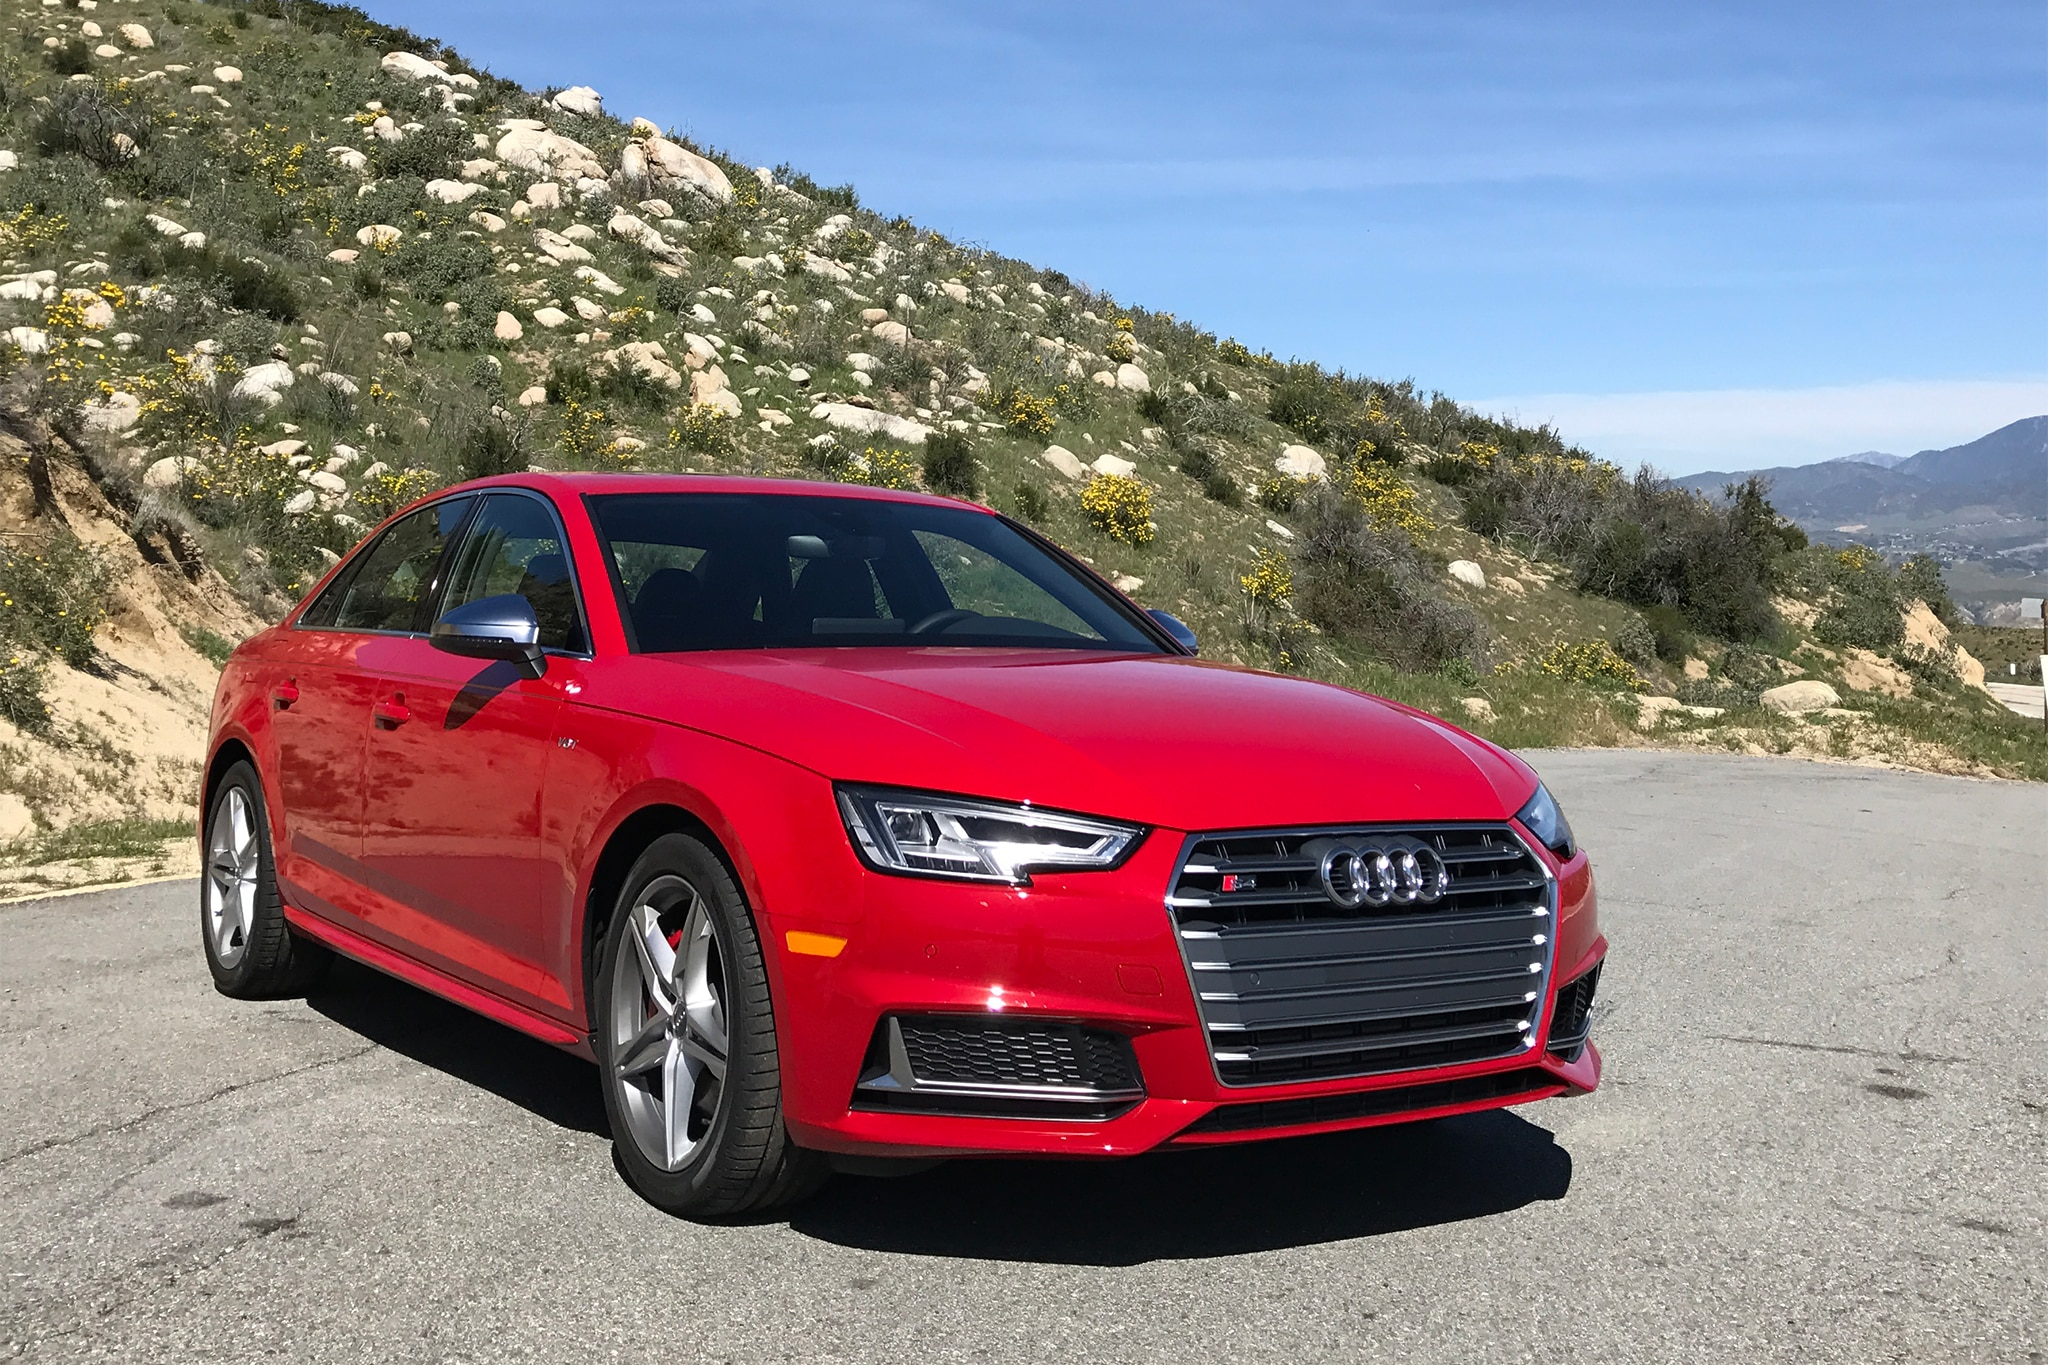 First Drive Audi S Automobile Magazine - 2018 audi s4